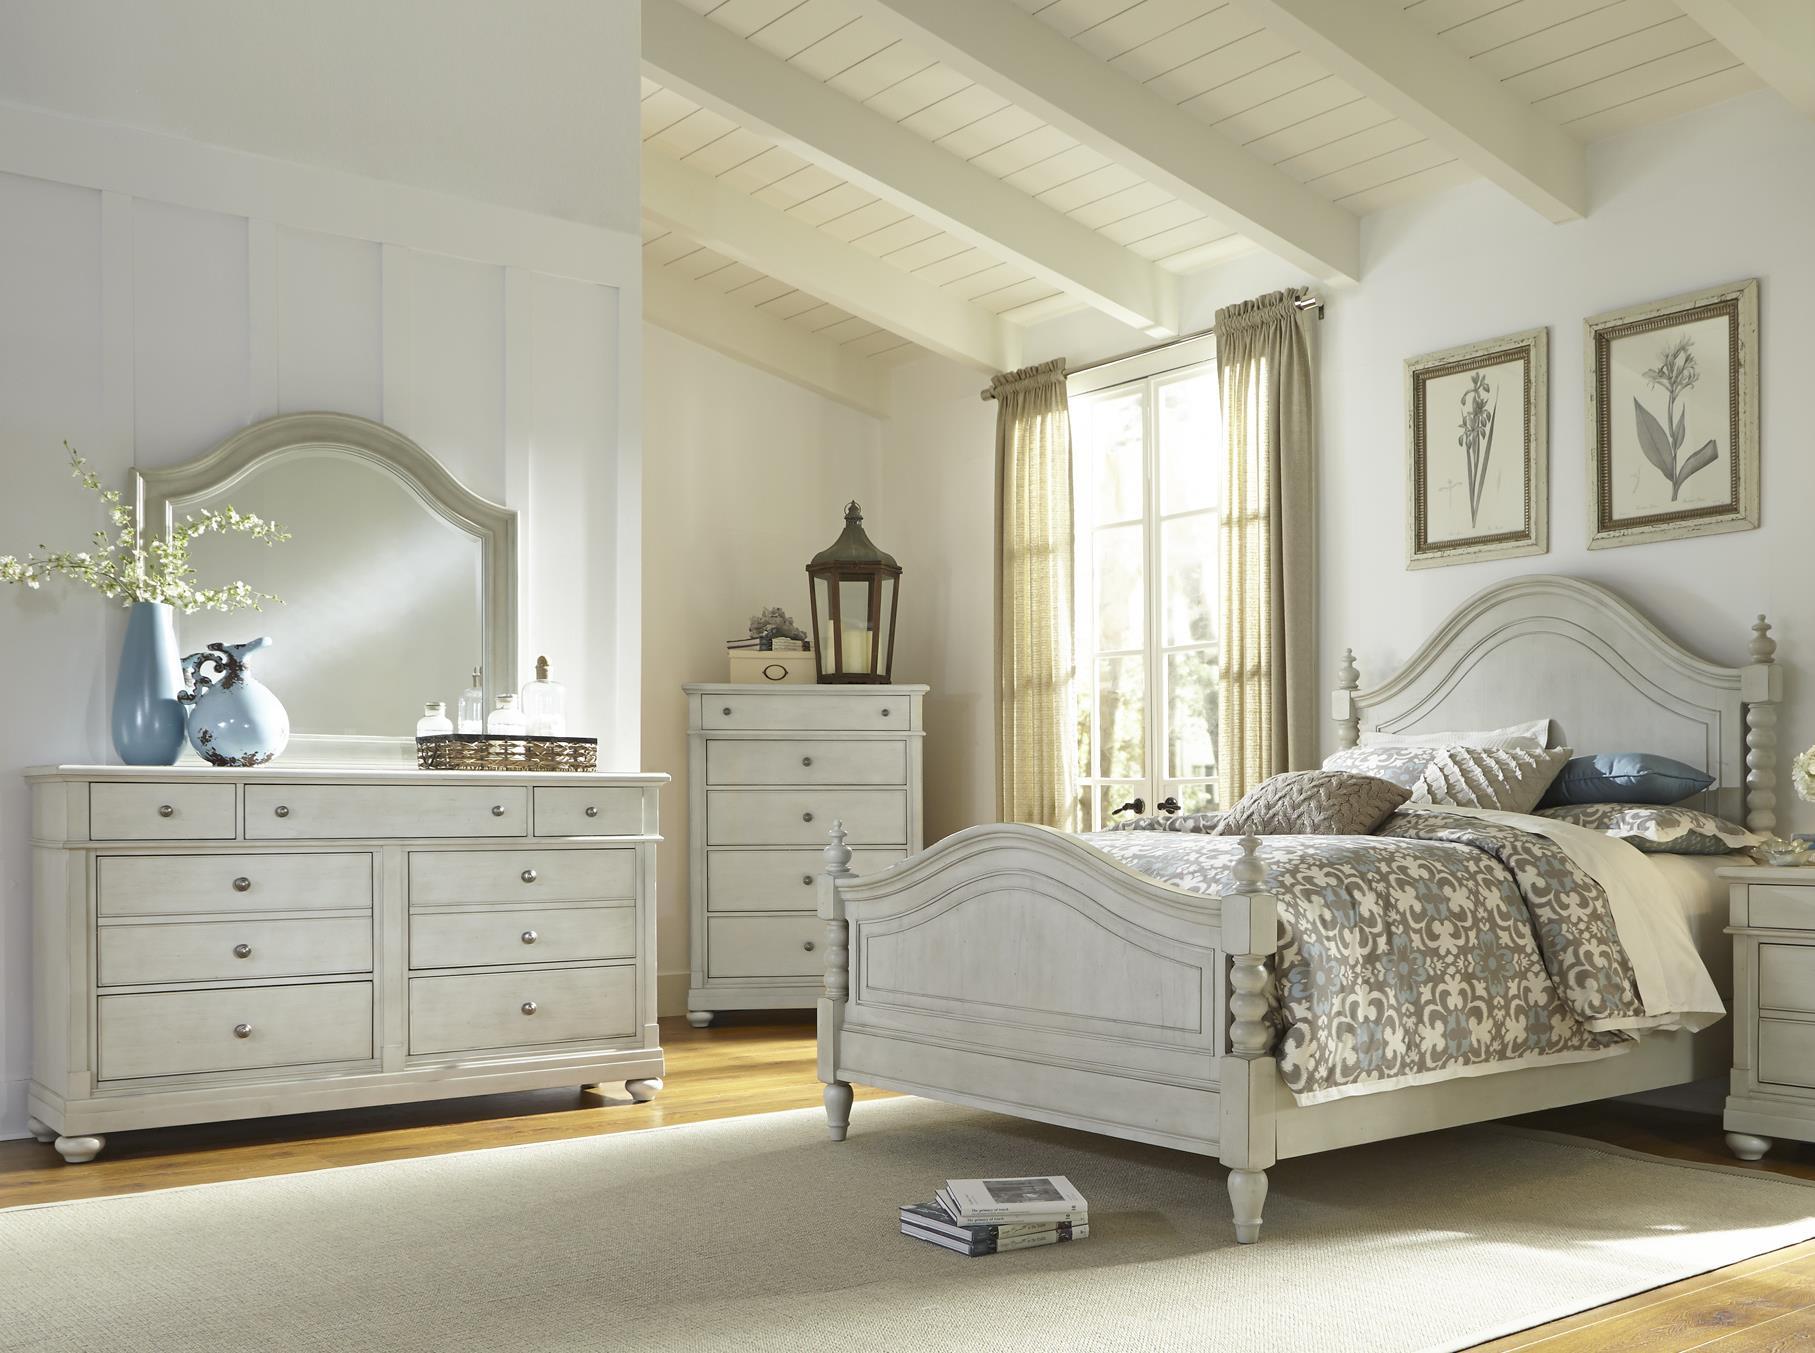 Liberty Furniture Harbor View Queen Bedroom Group - Item Number: 731-BR-QPSDMC